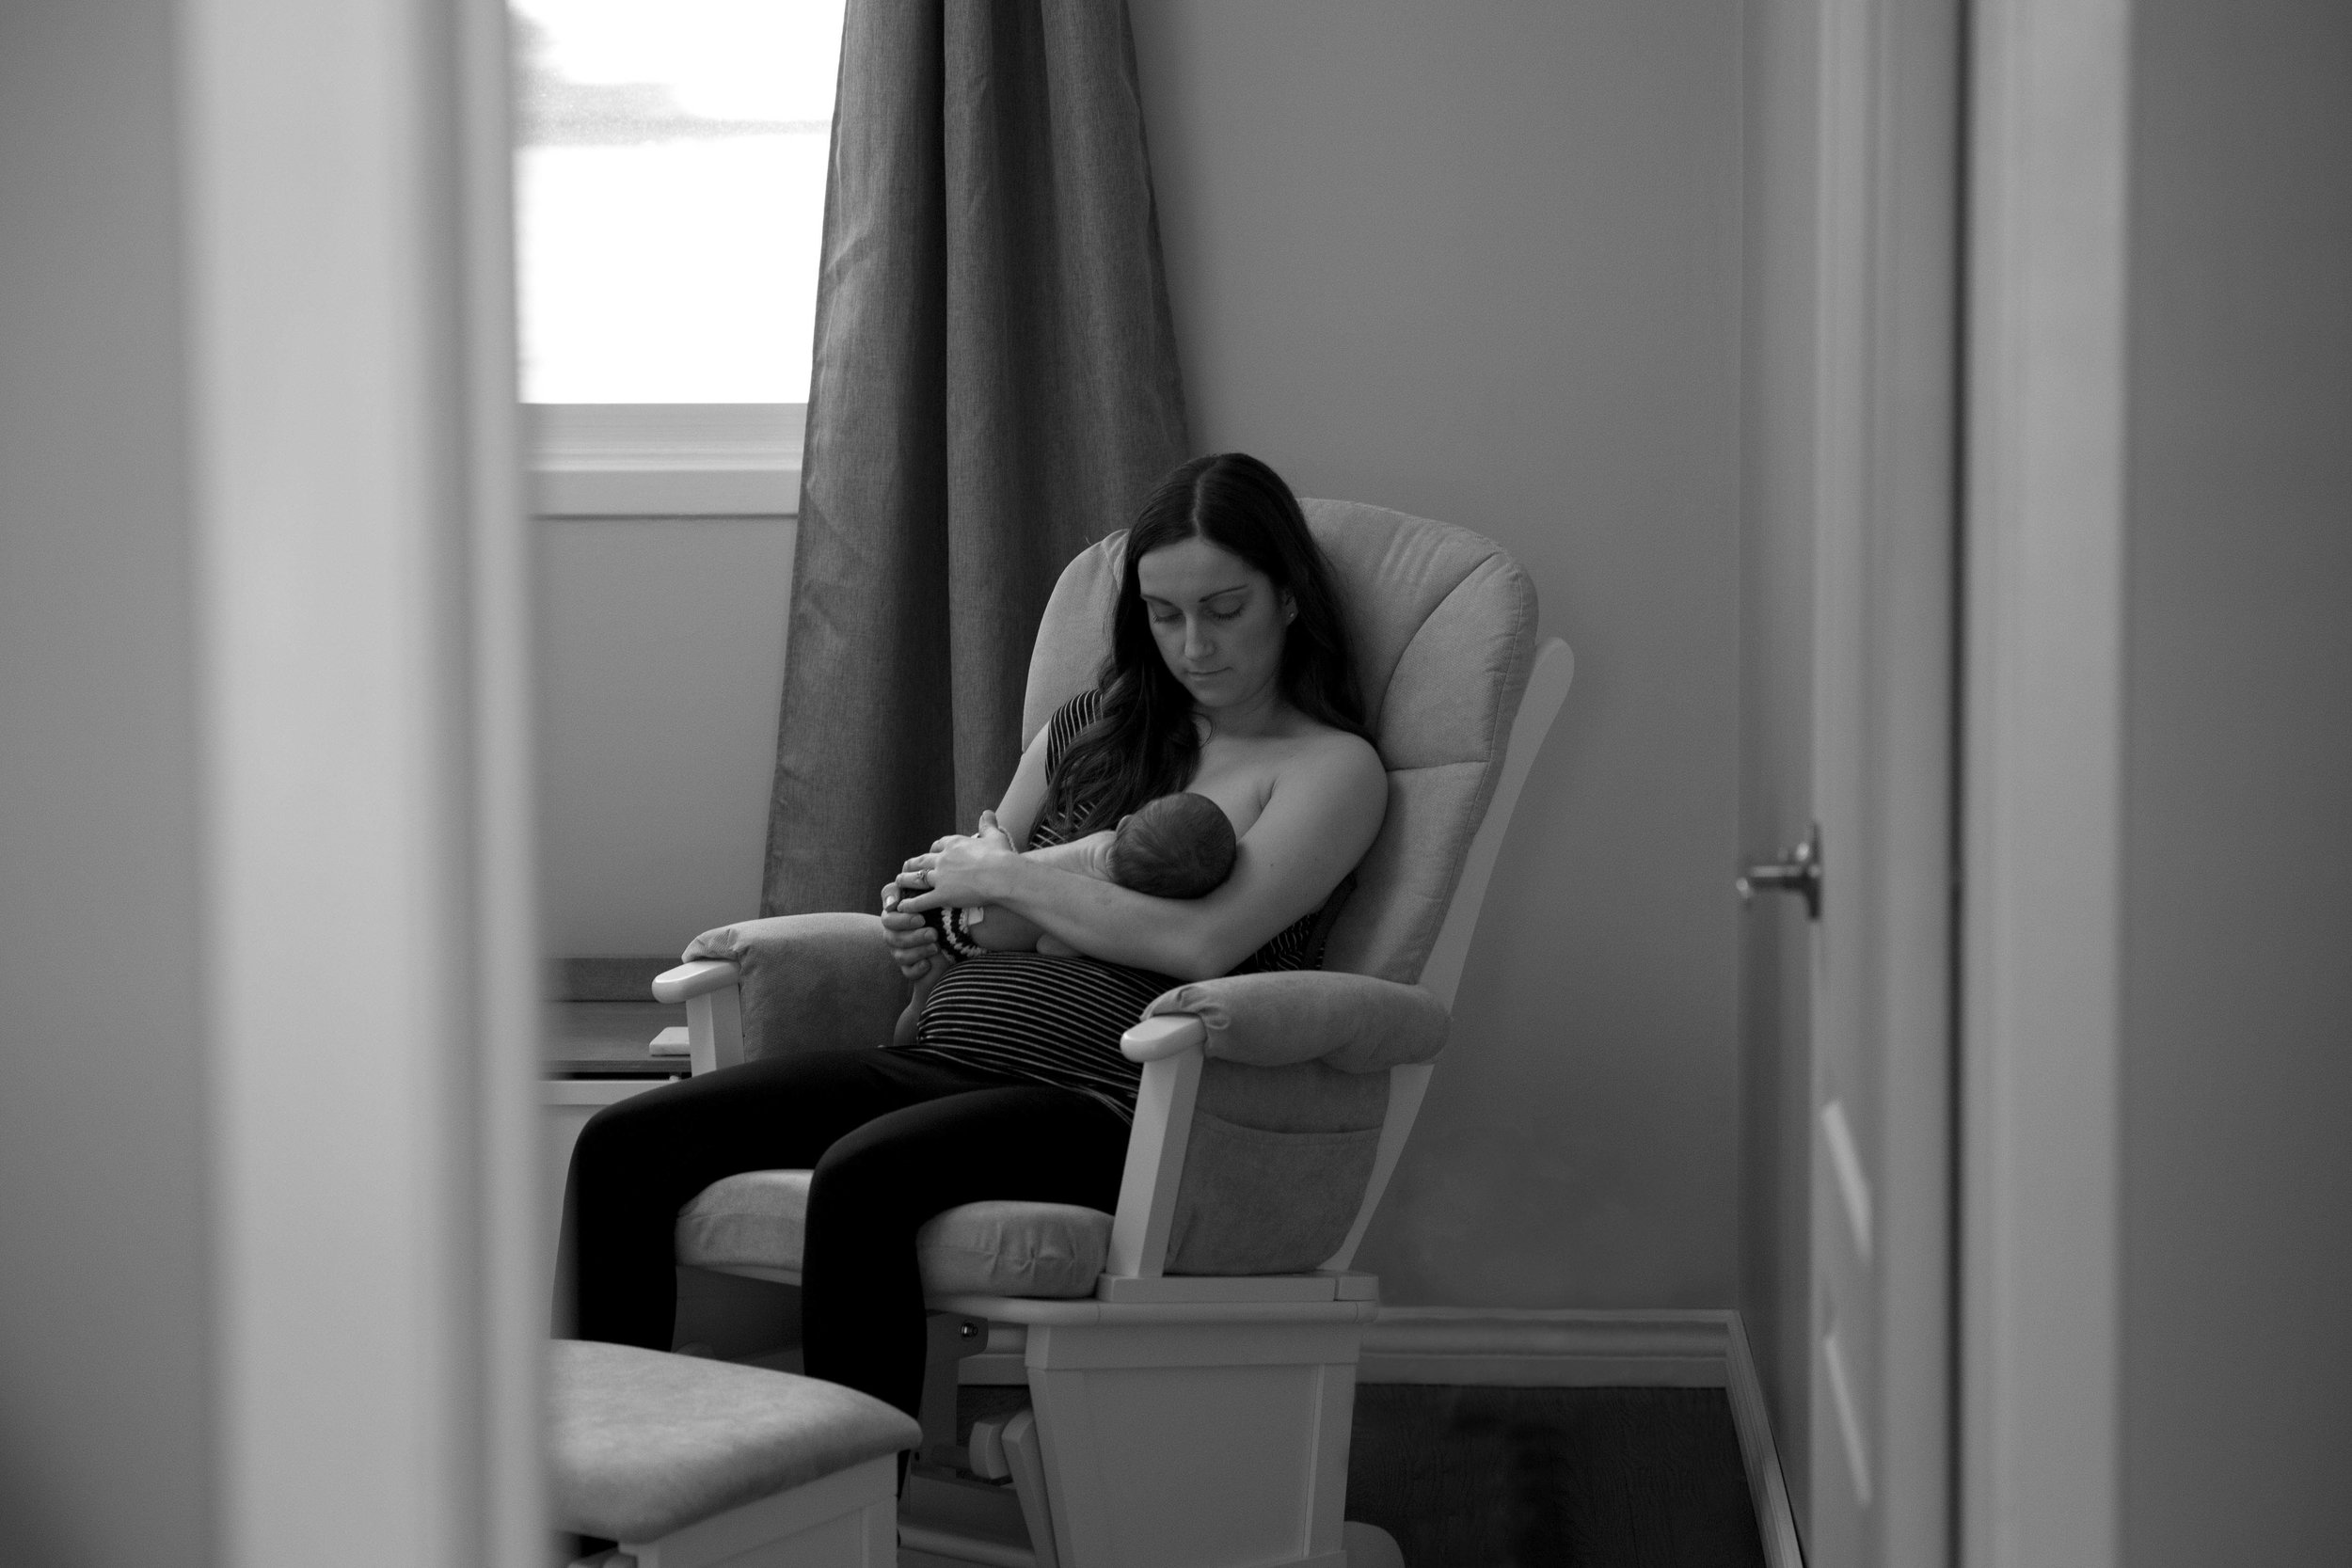 newbornphotography5.jpg